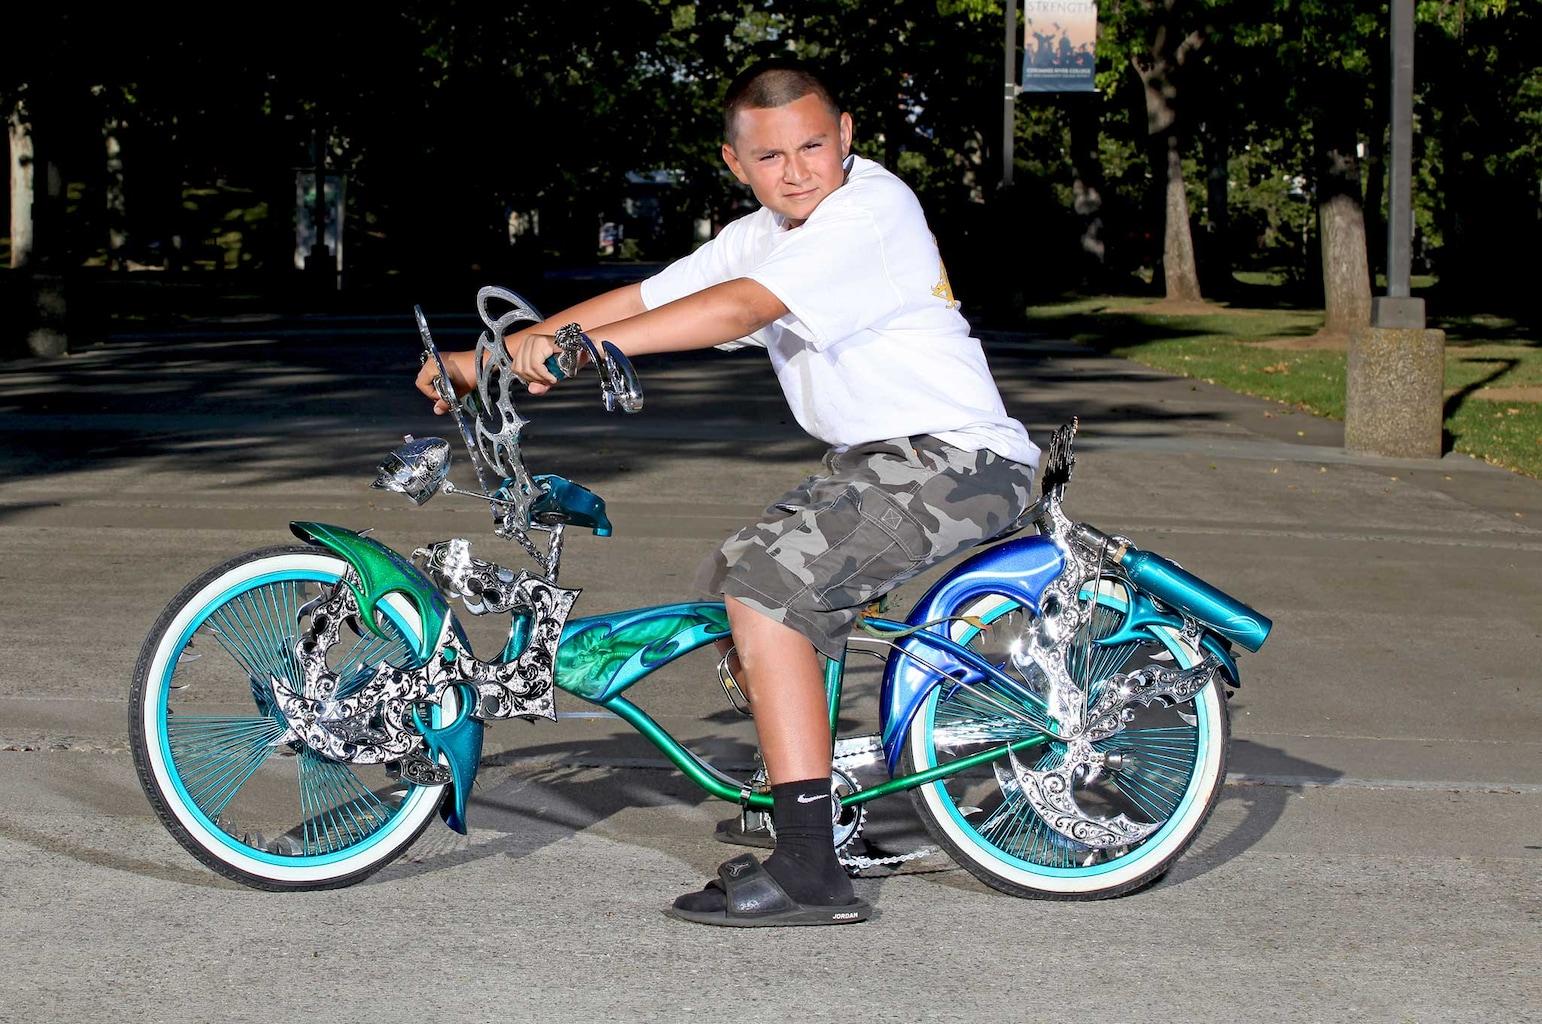 2000 aztlan bike moses espinoza 002